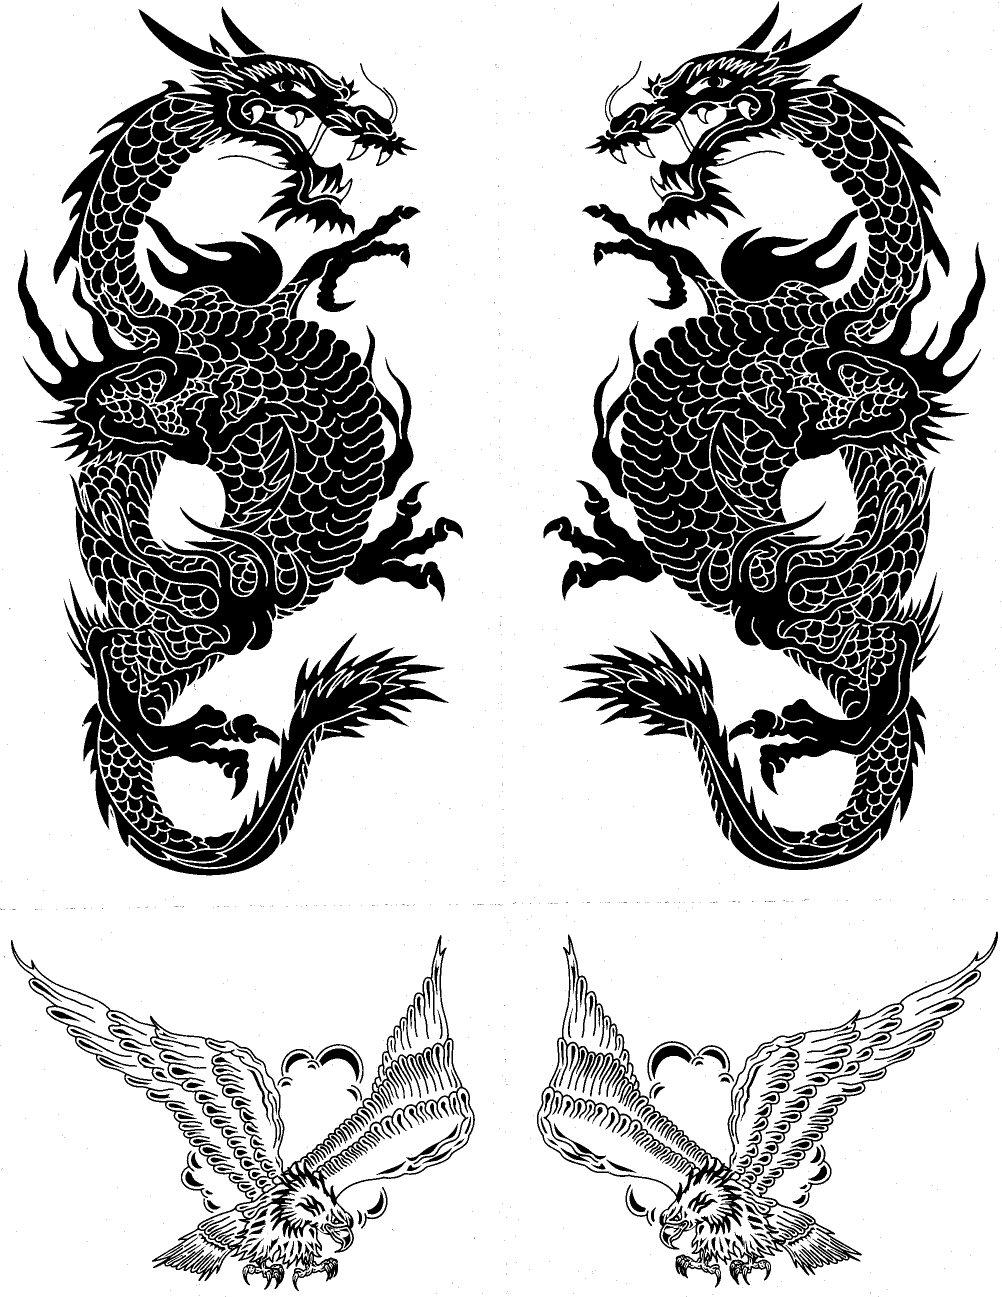 THE BLACK TATTOOS Dark Henna Tattoos